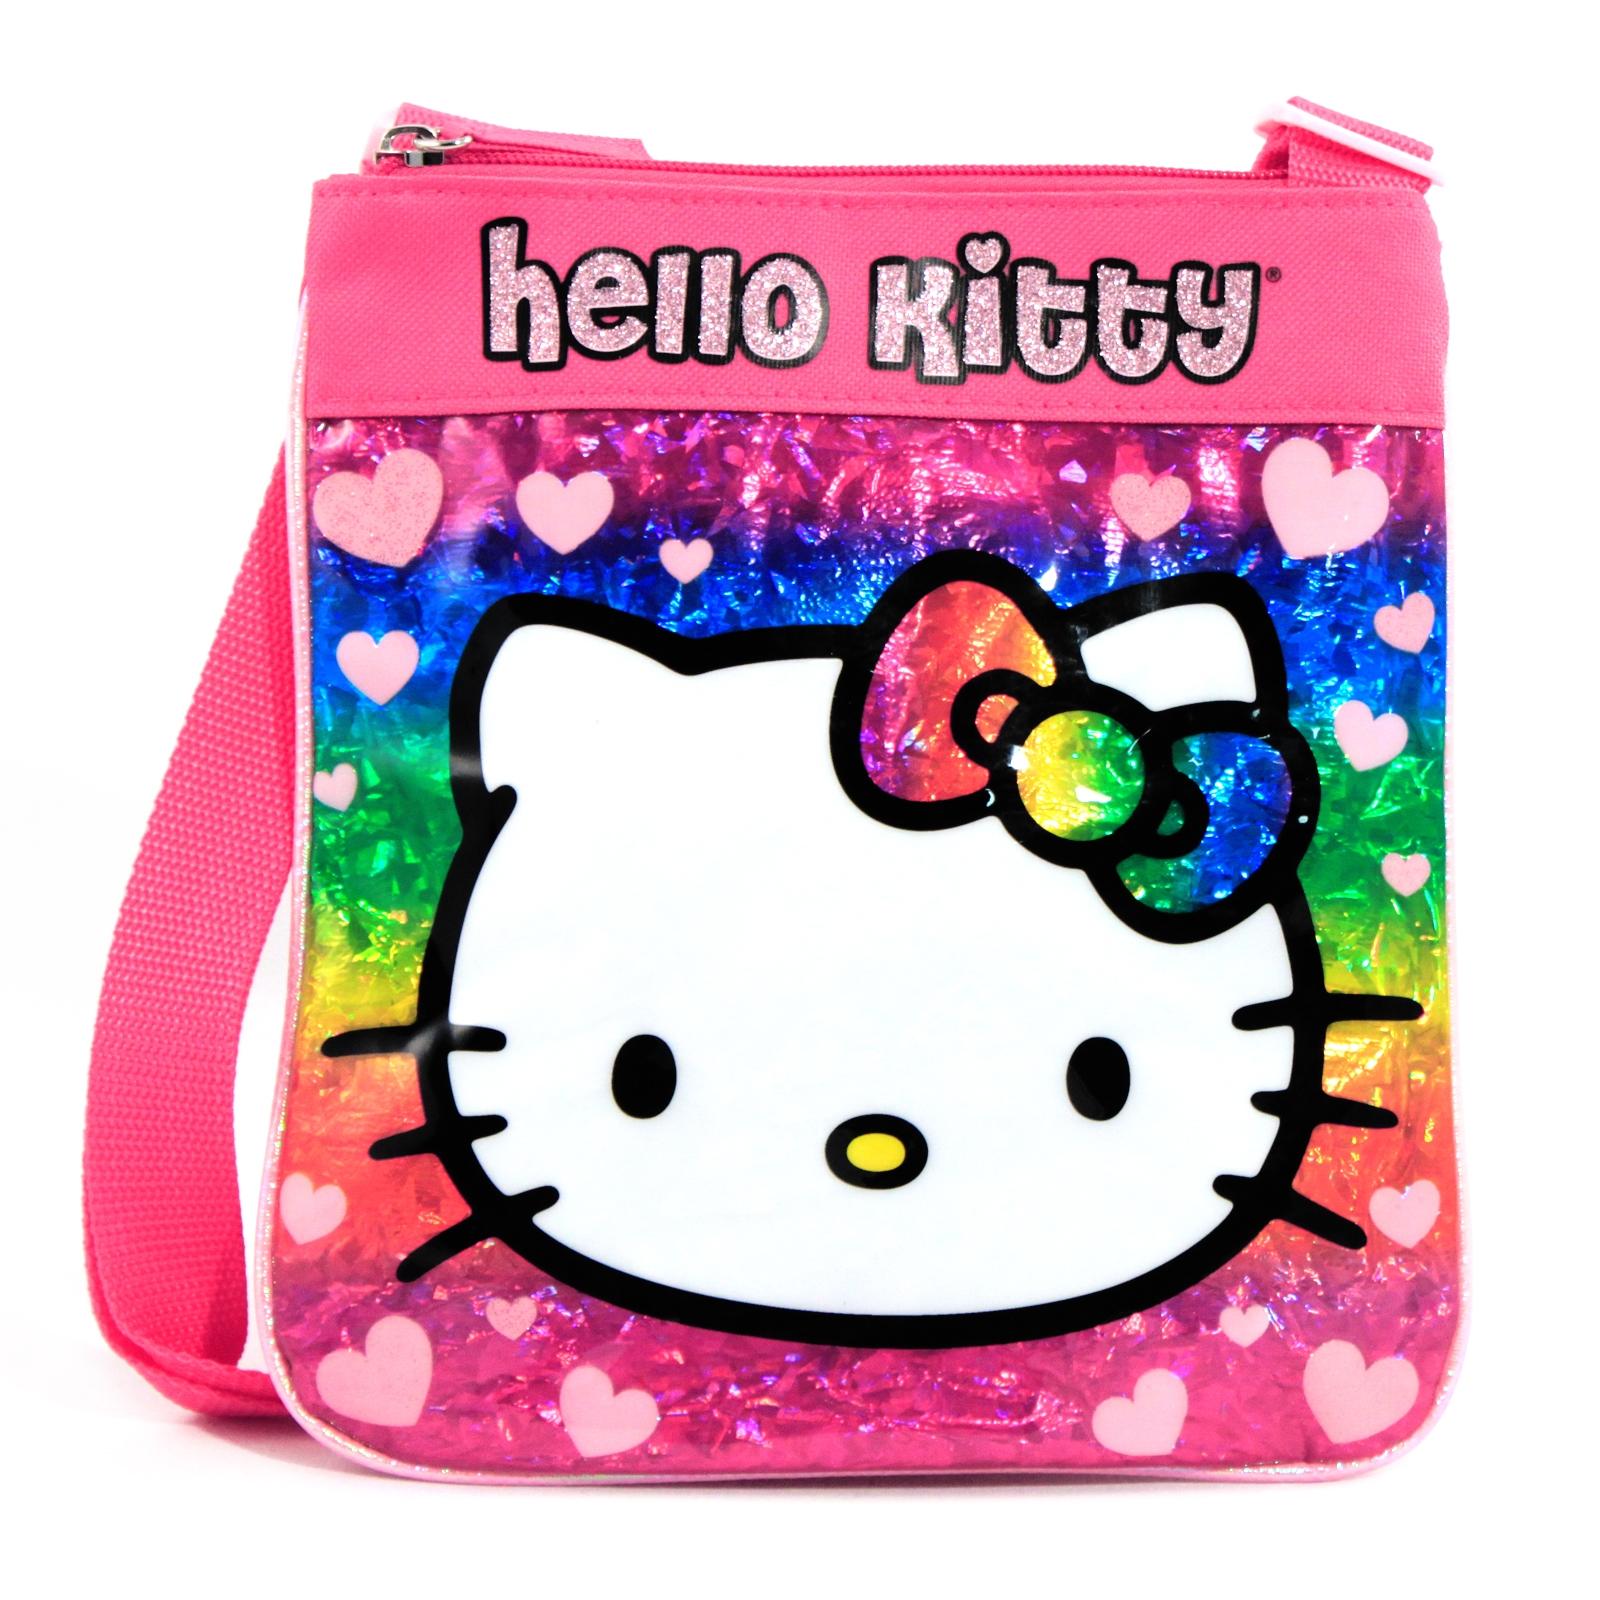 Sanrio Hello Kitty Girls Passport Messenger Bag